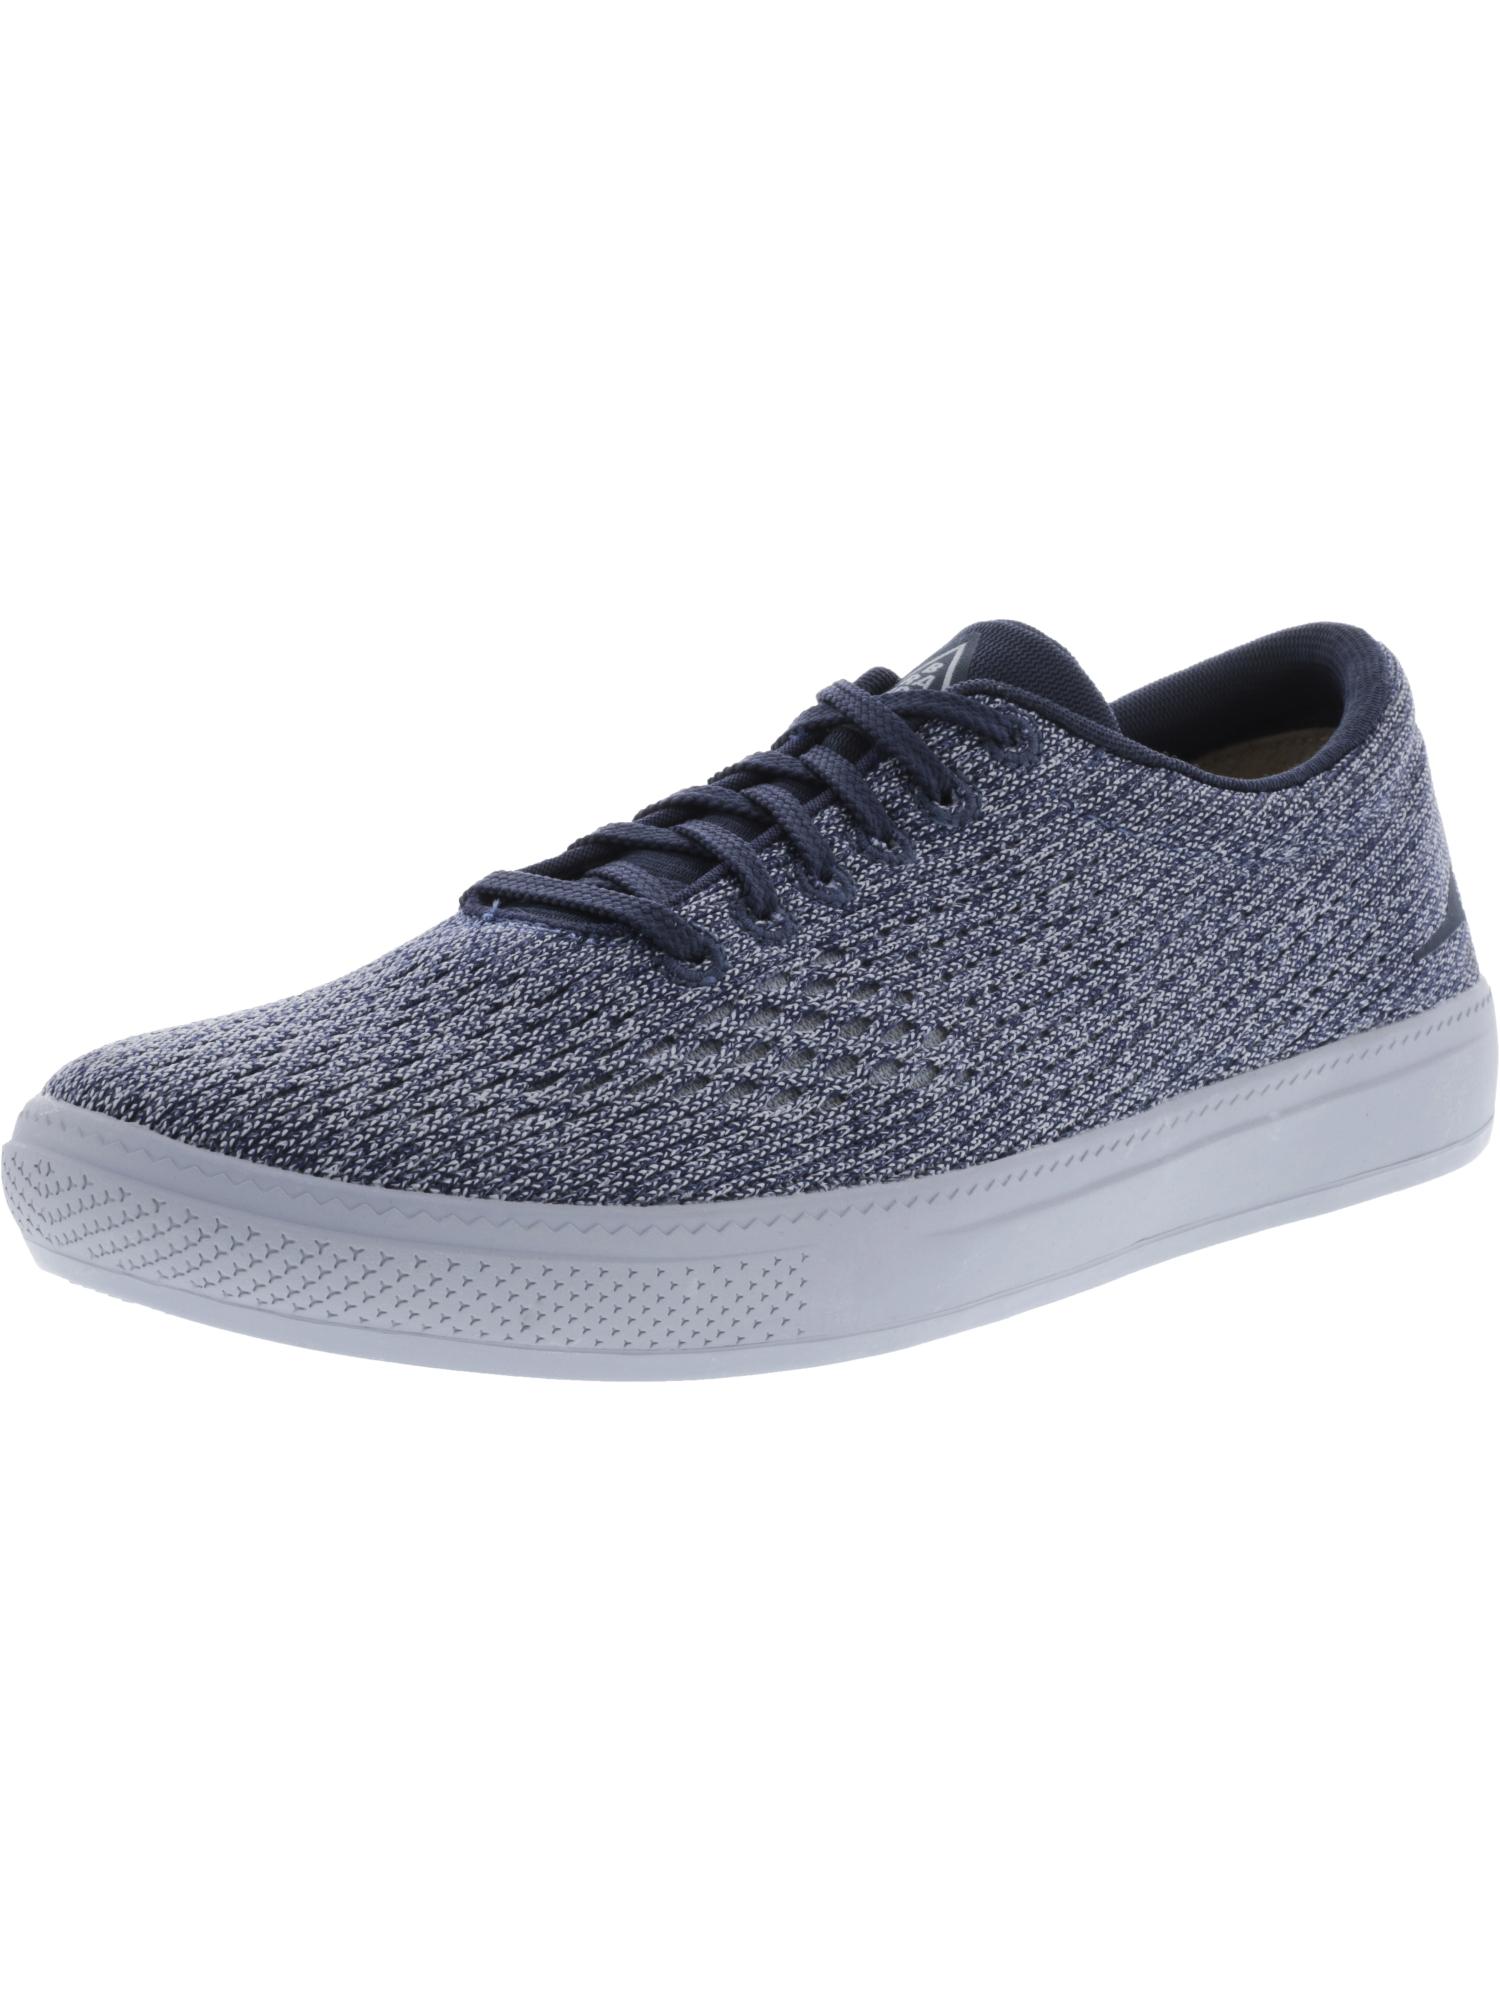 premium selection 4404c e1d28 ... Brandblack Men s August August August Ii Ankle-High Fashion Sneaker  533fa5